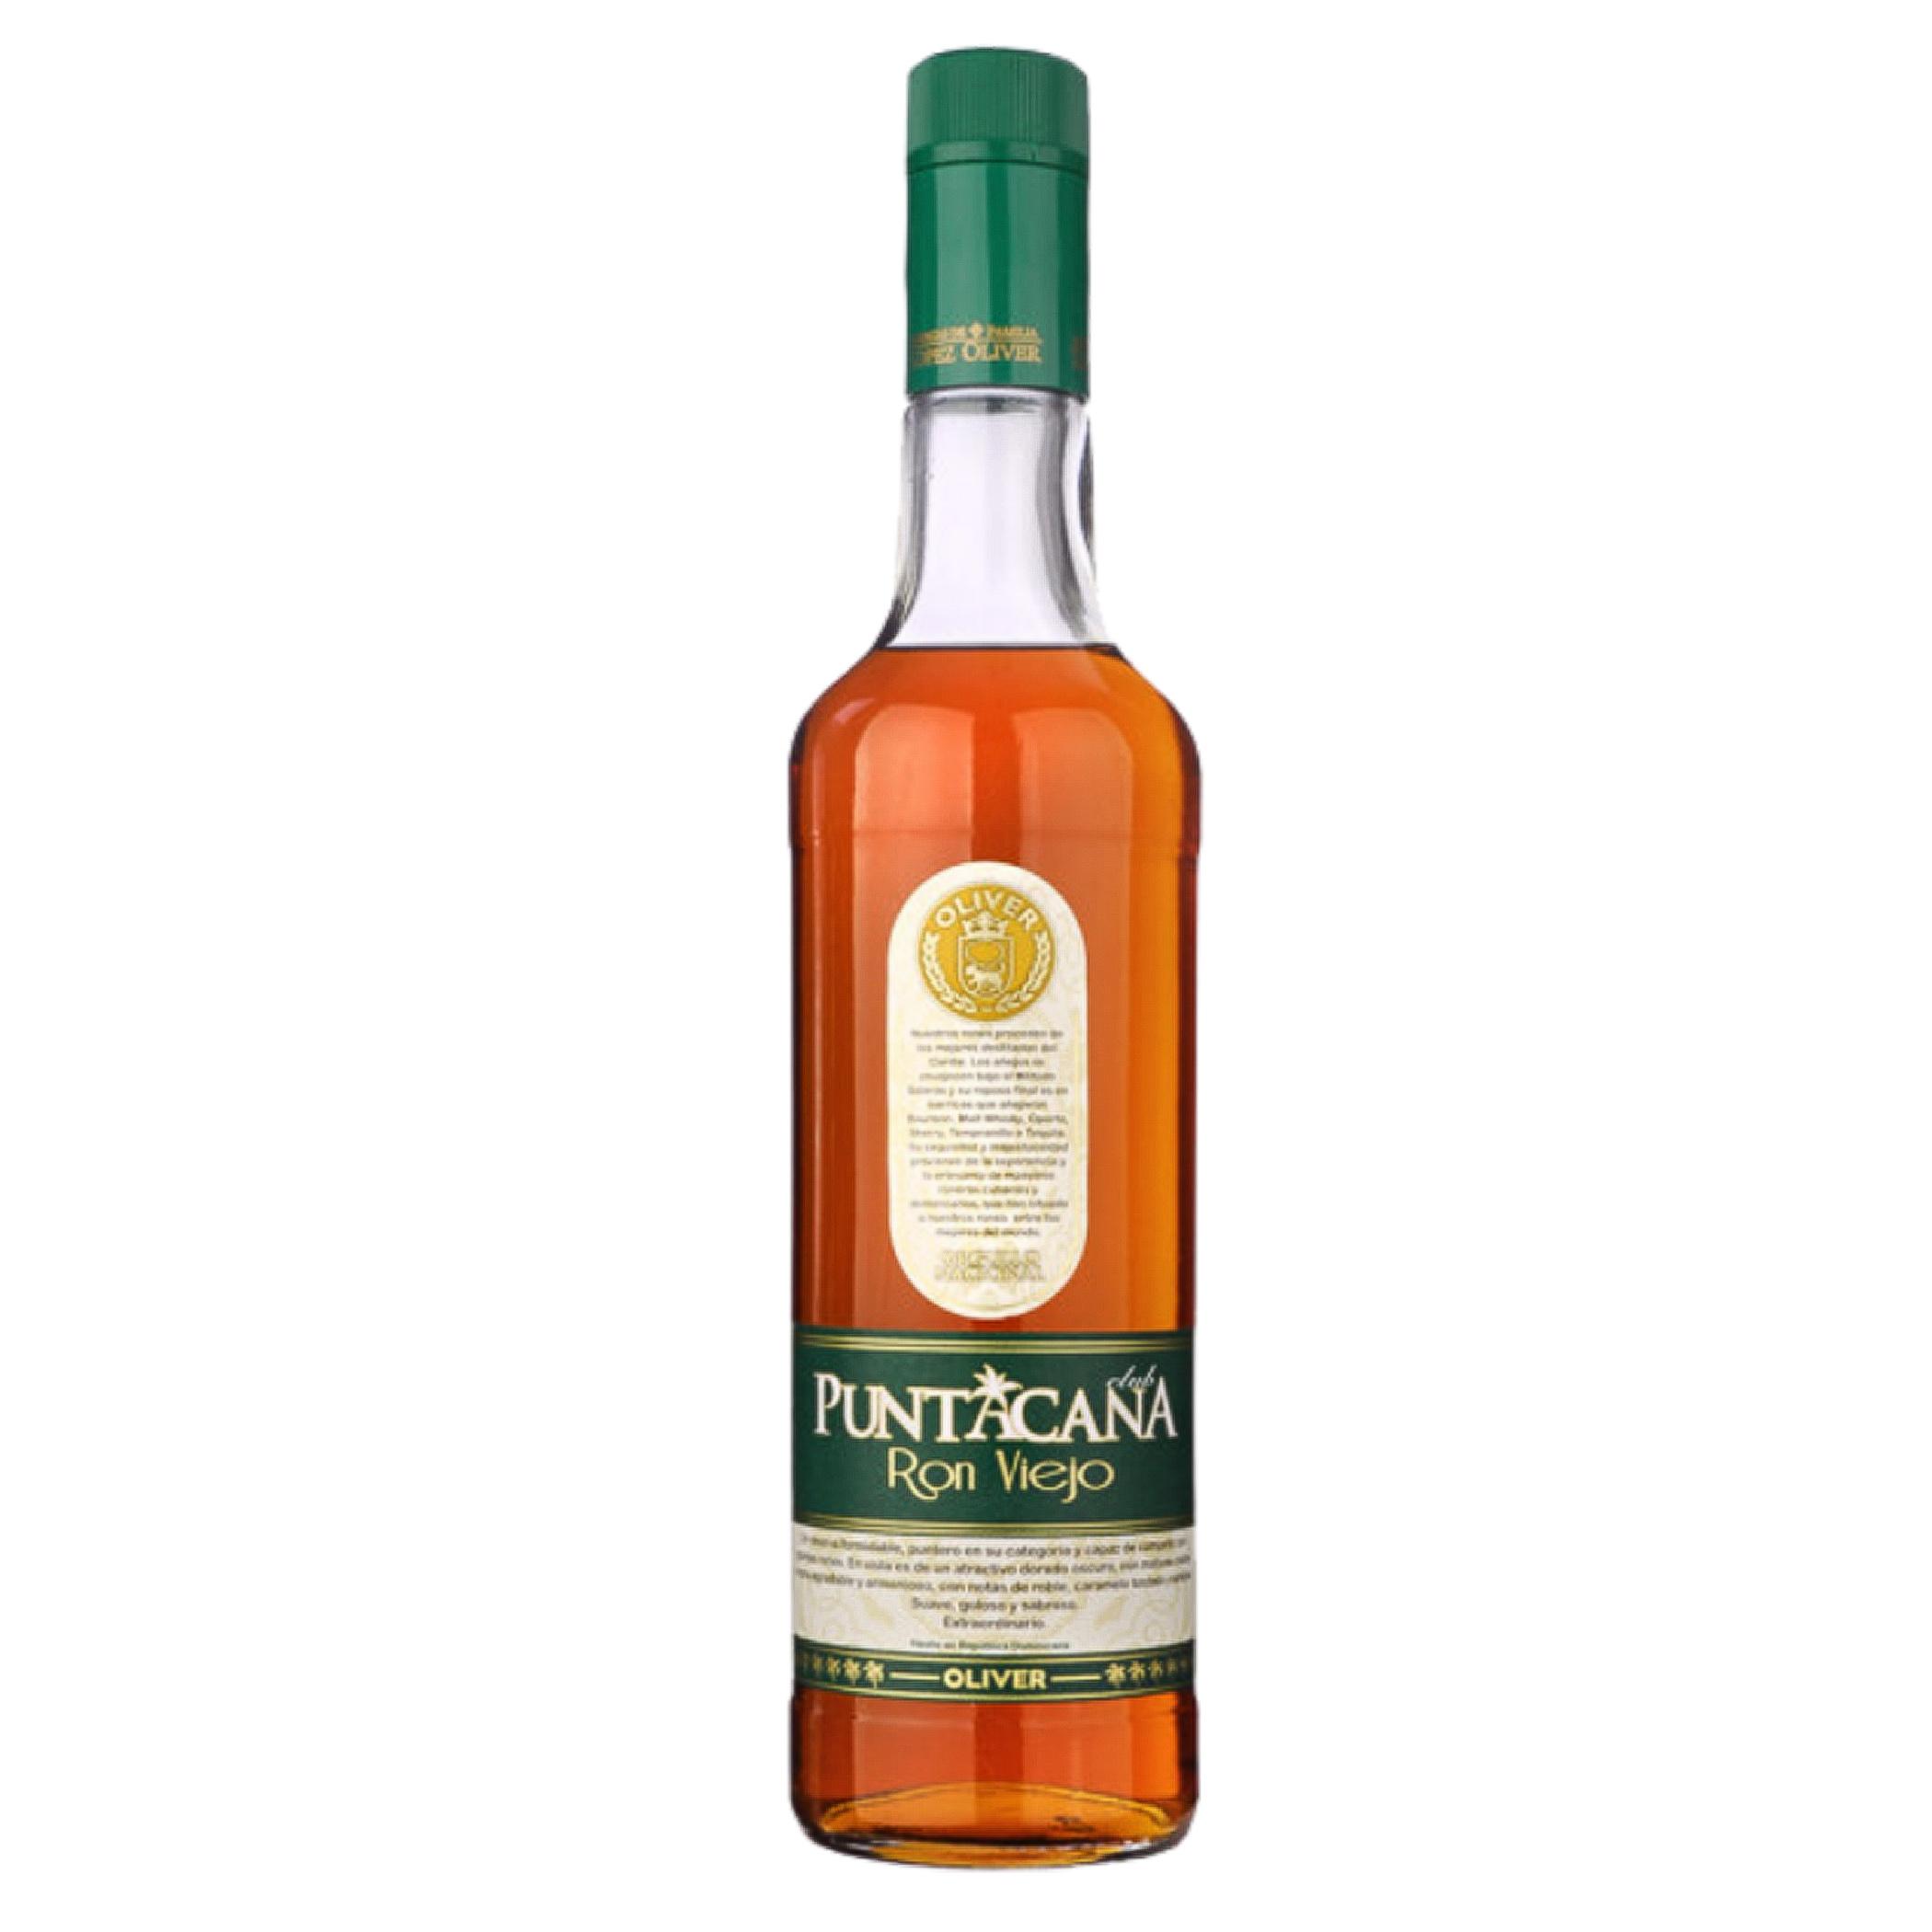 Punta Cana Ron Viejo Rum